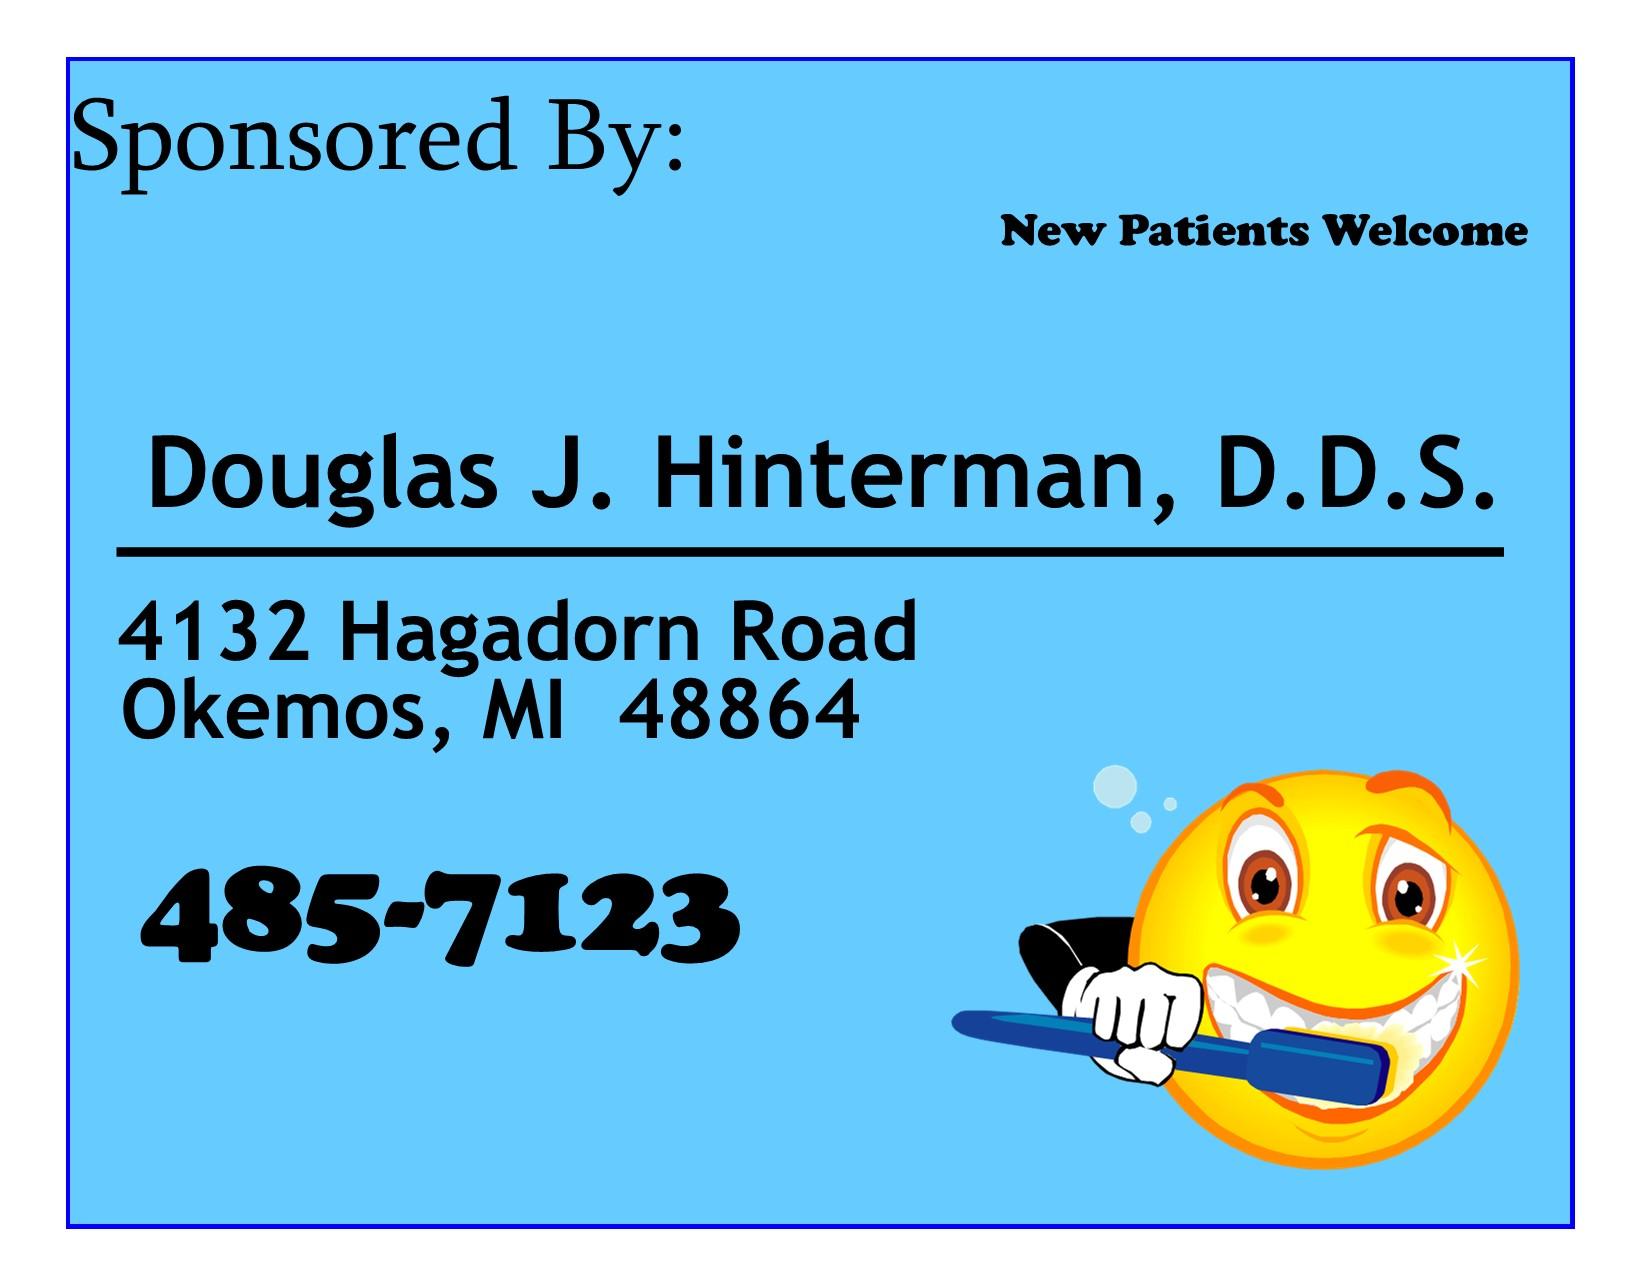 dr. hinterman ad